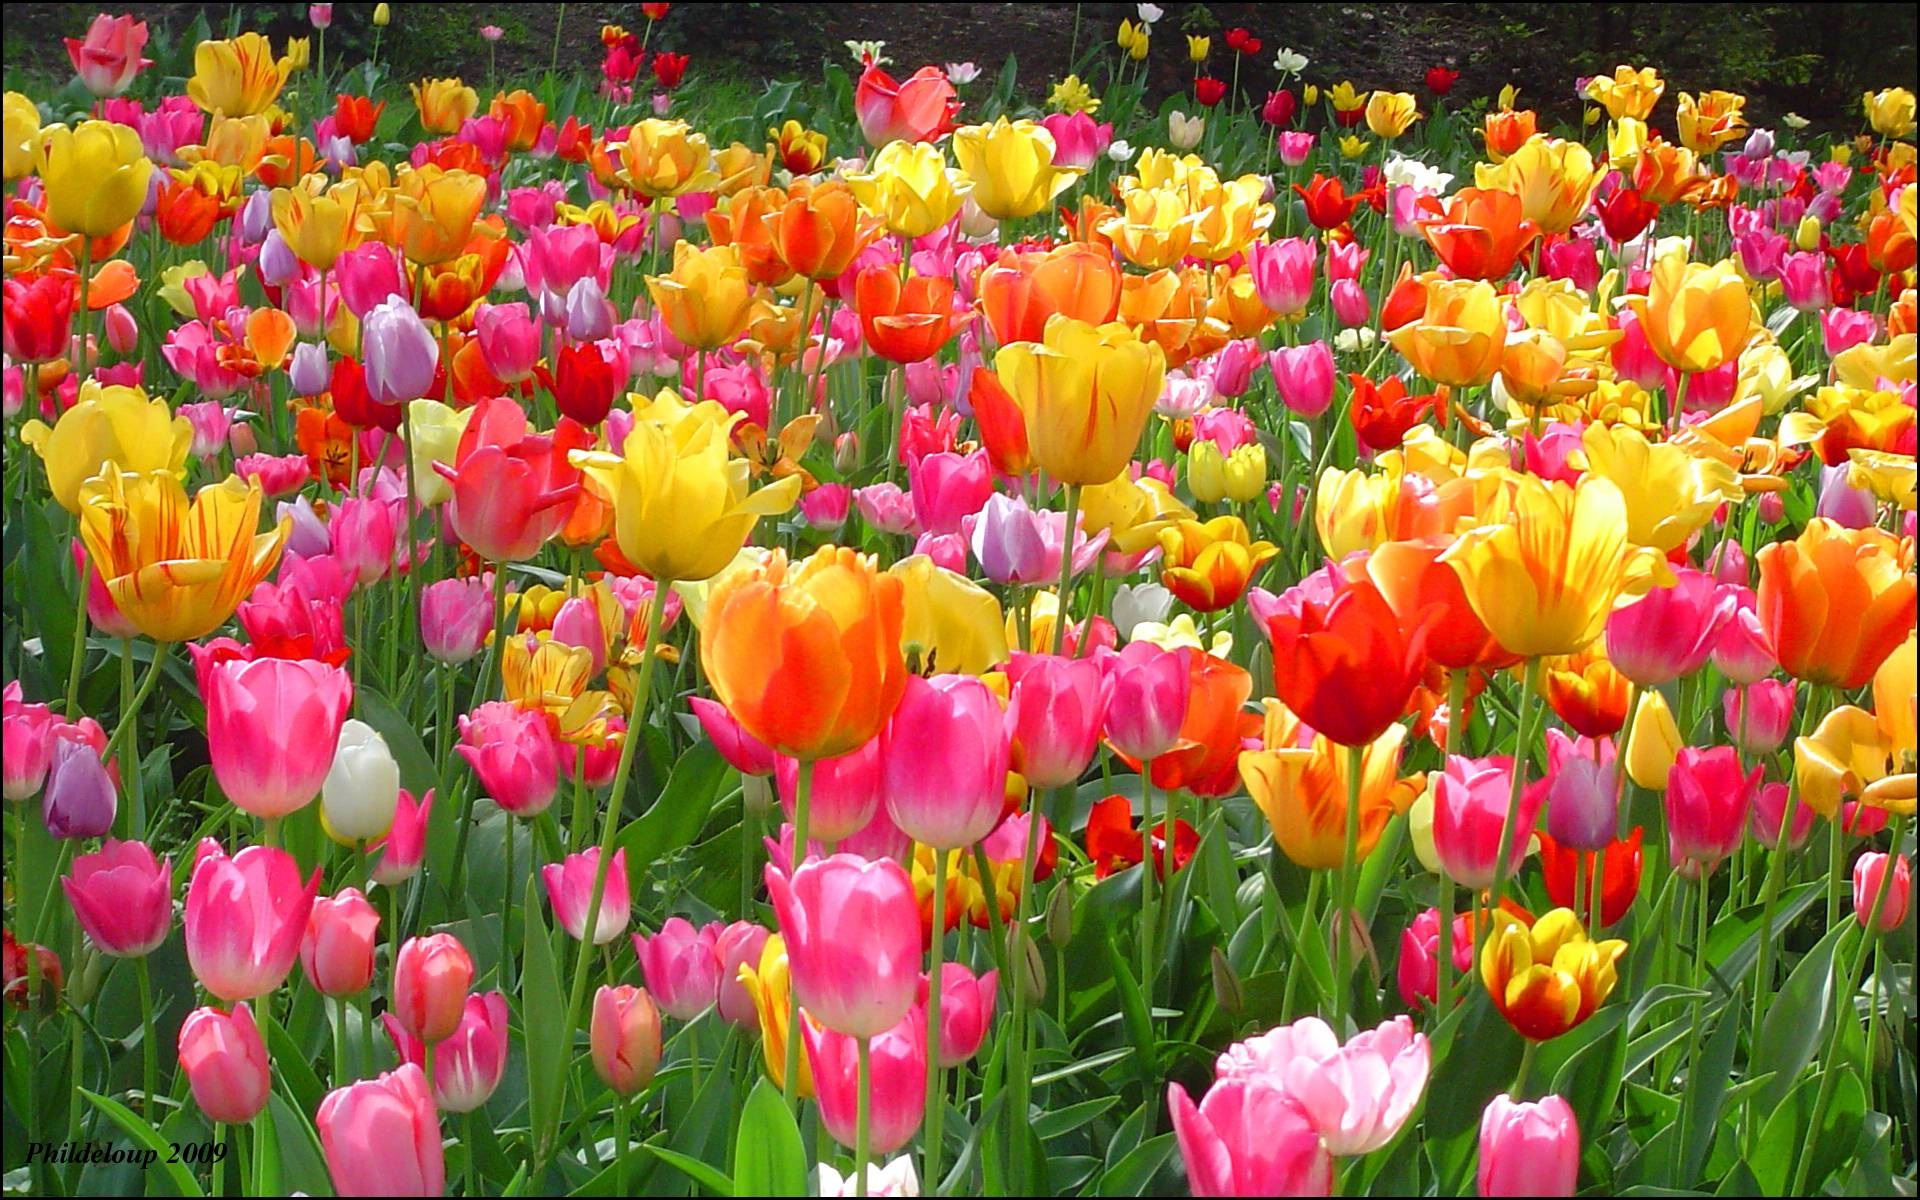 White Tulips Wallpapers, 40 White Tulips 2016 Wallpaper'-s Archive ...